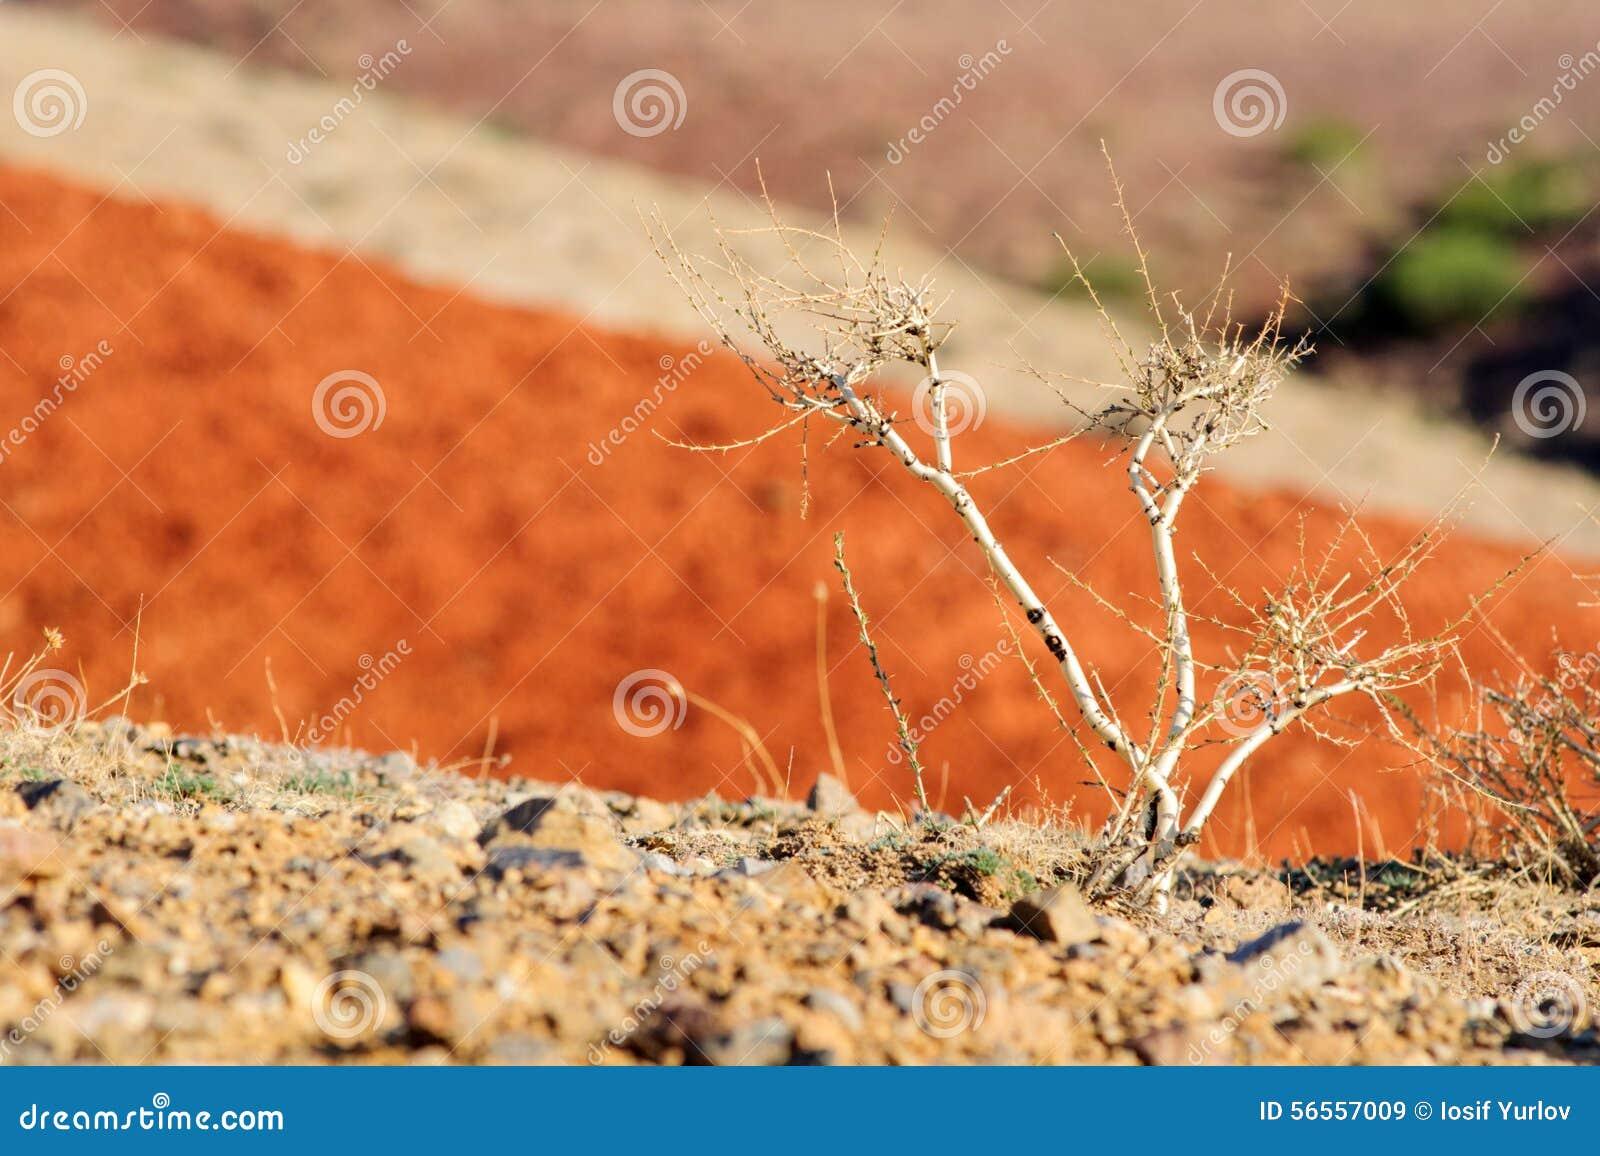 Download Χώμα χρώματος των καταθέσεων υδραργύρου Στοκ Εικόνα - εικόνα από φύση, λιβάδι: 56557009